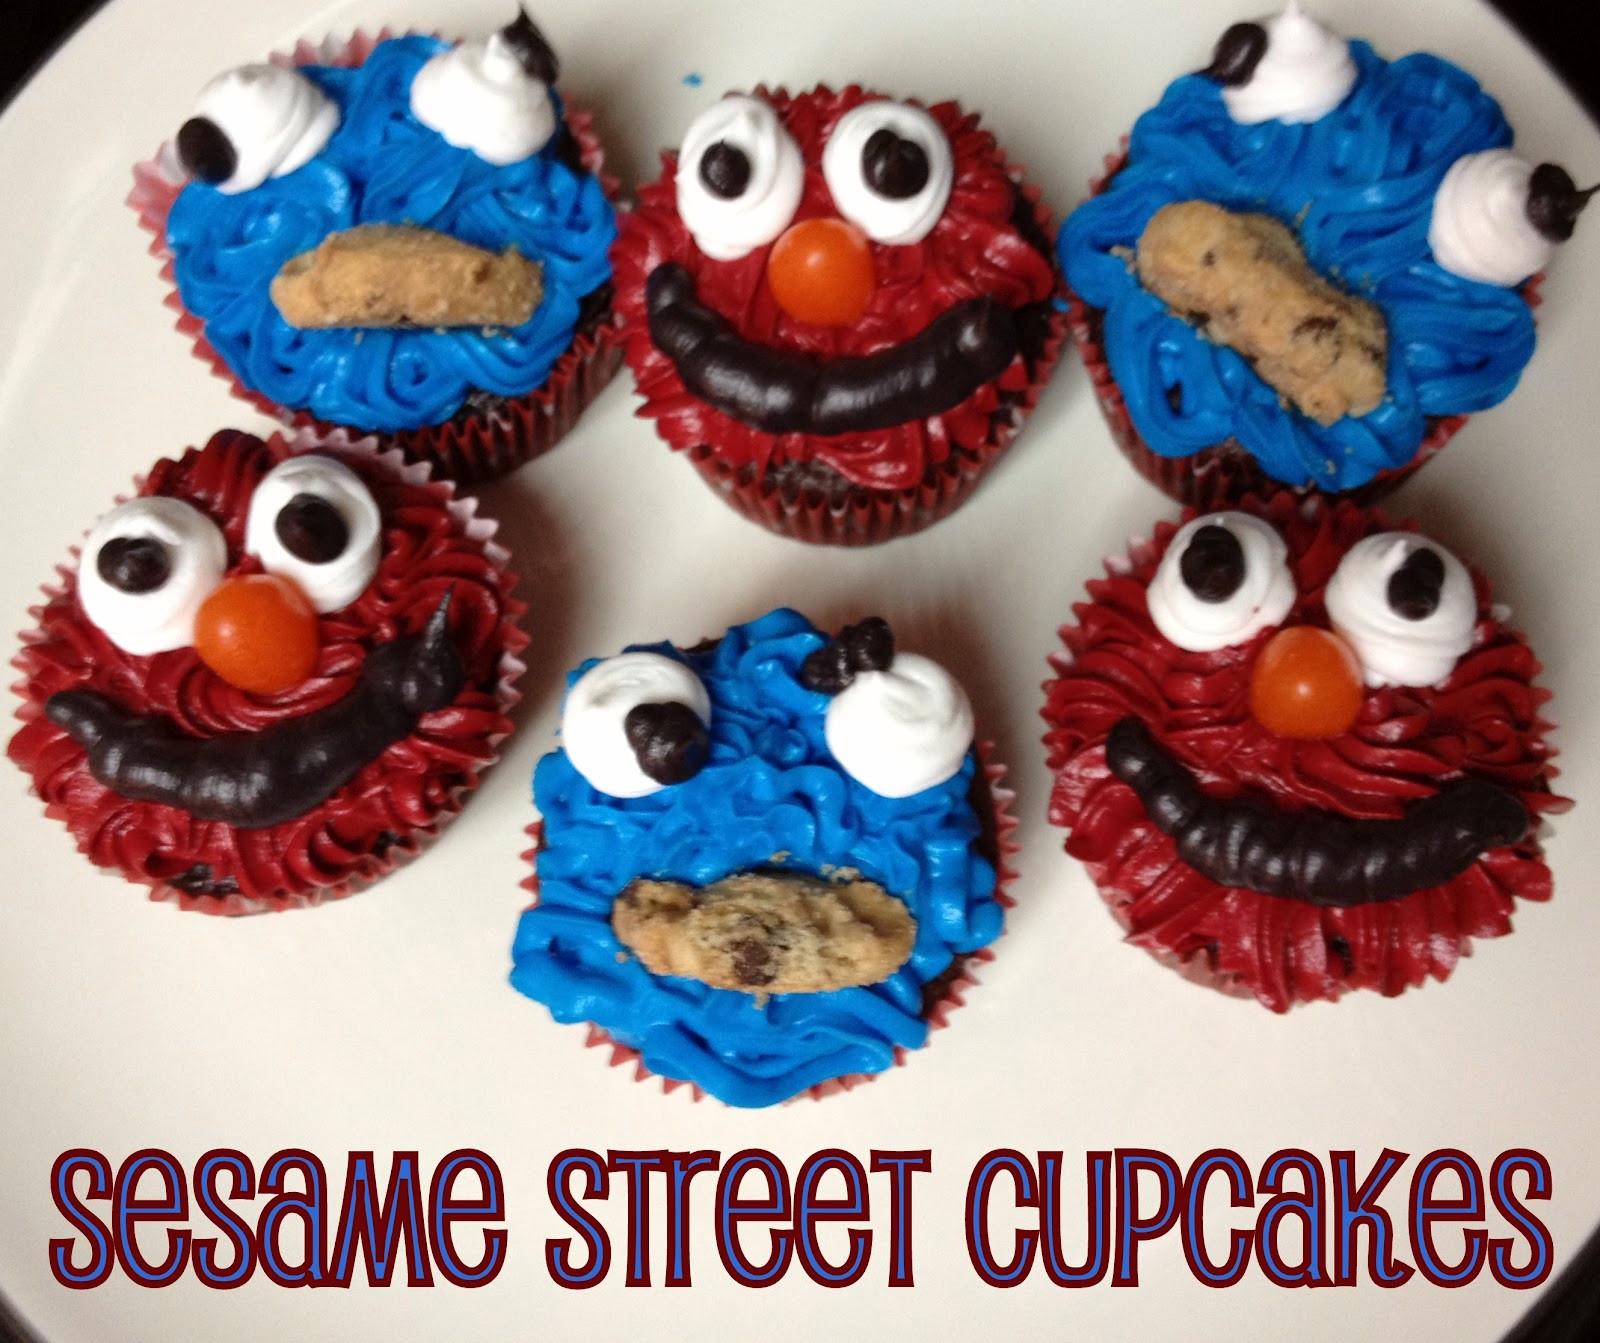 Sesame Street Cupcakes  Snips & Spice Sesame Street Cupcakes